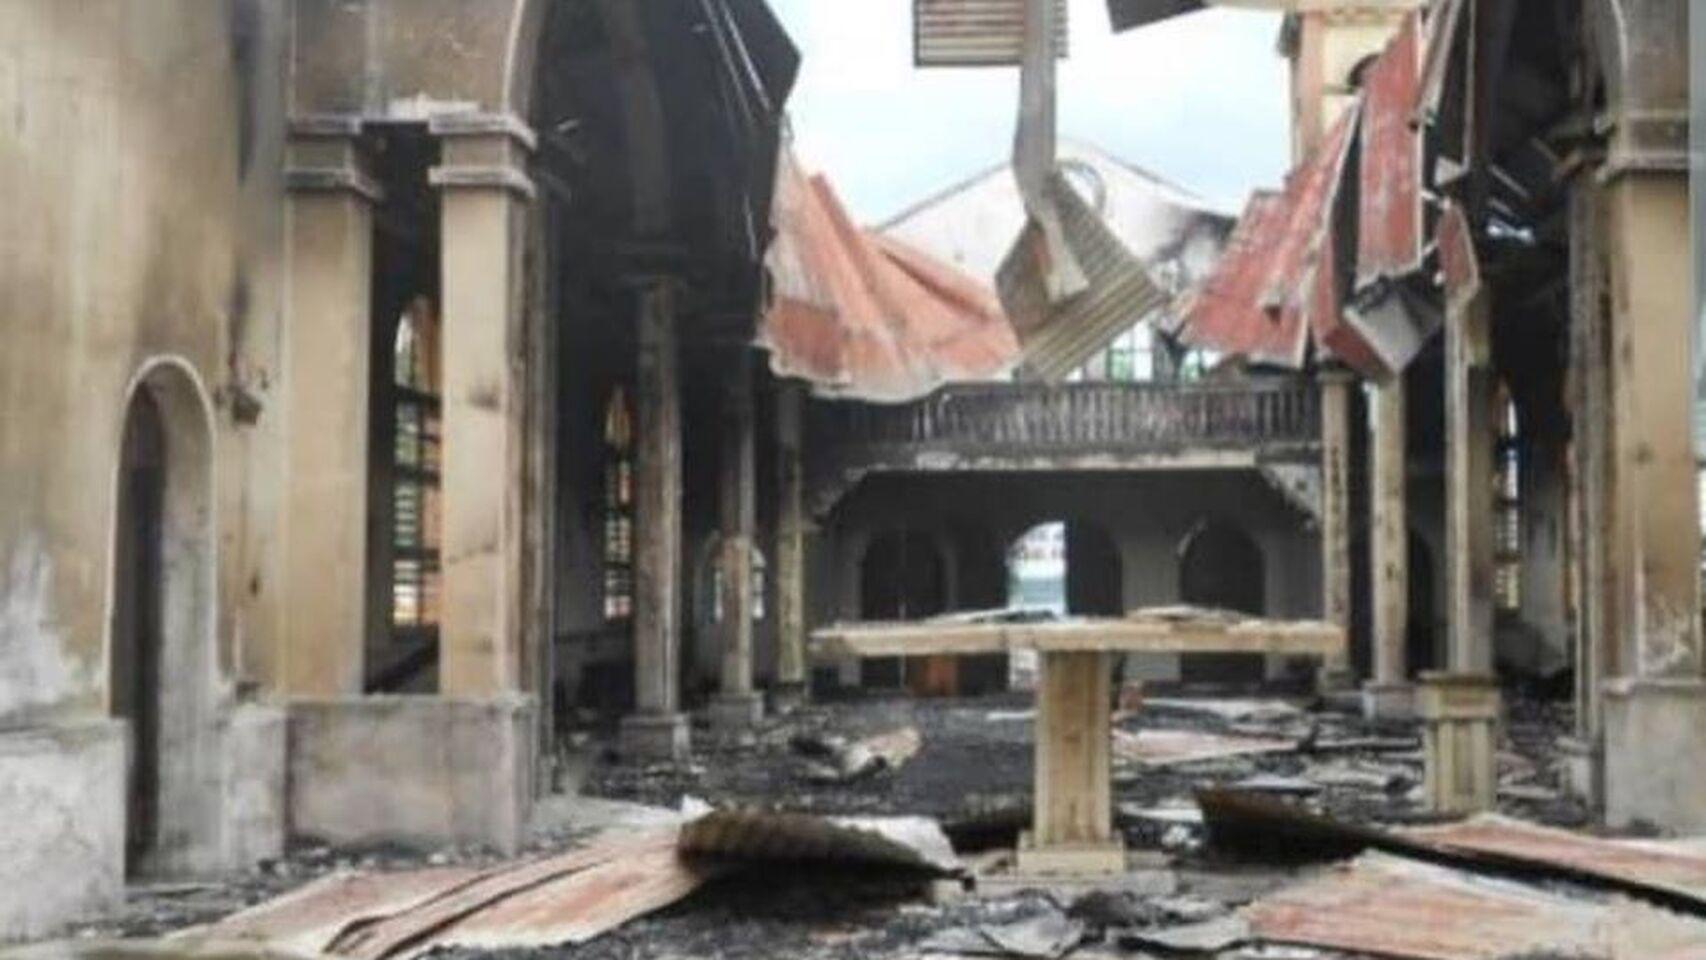 Guinea Ecuatorial: un incendio consume la catedral de Malabo, de influencia española